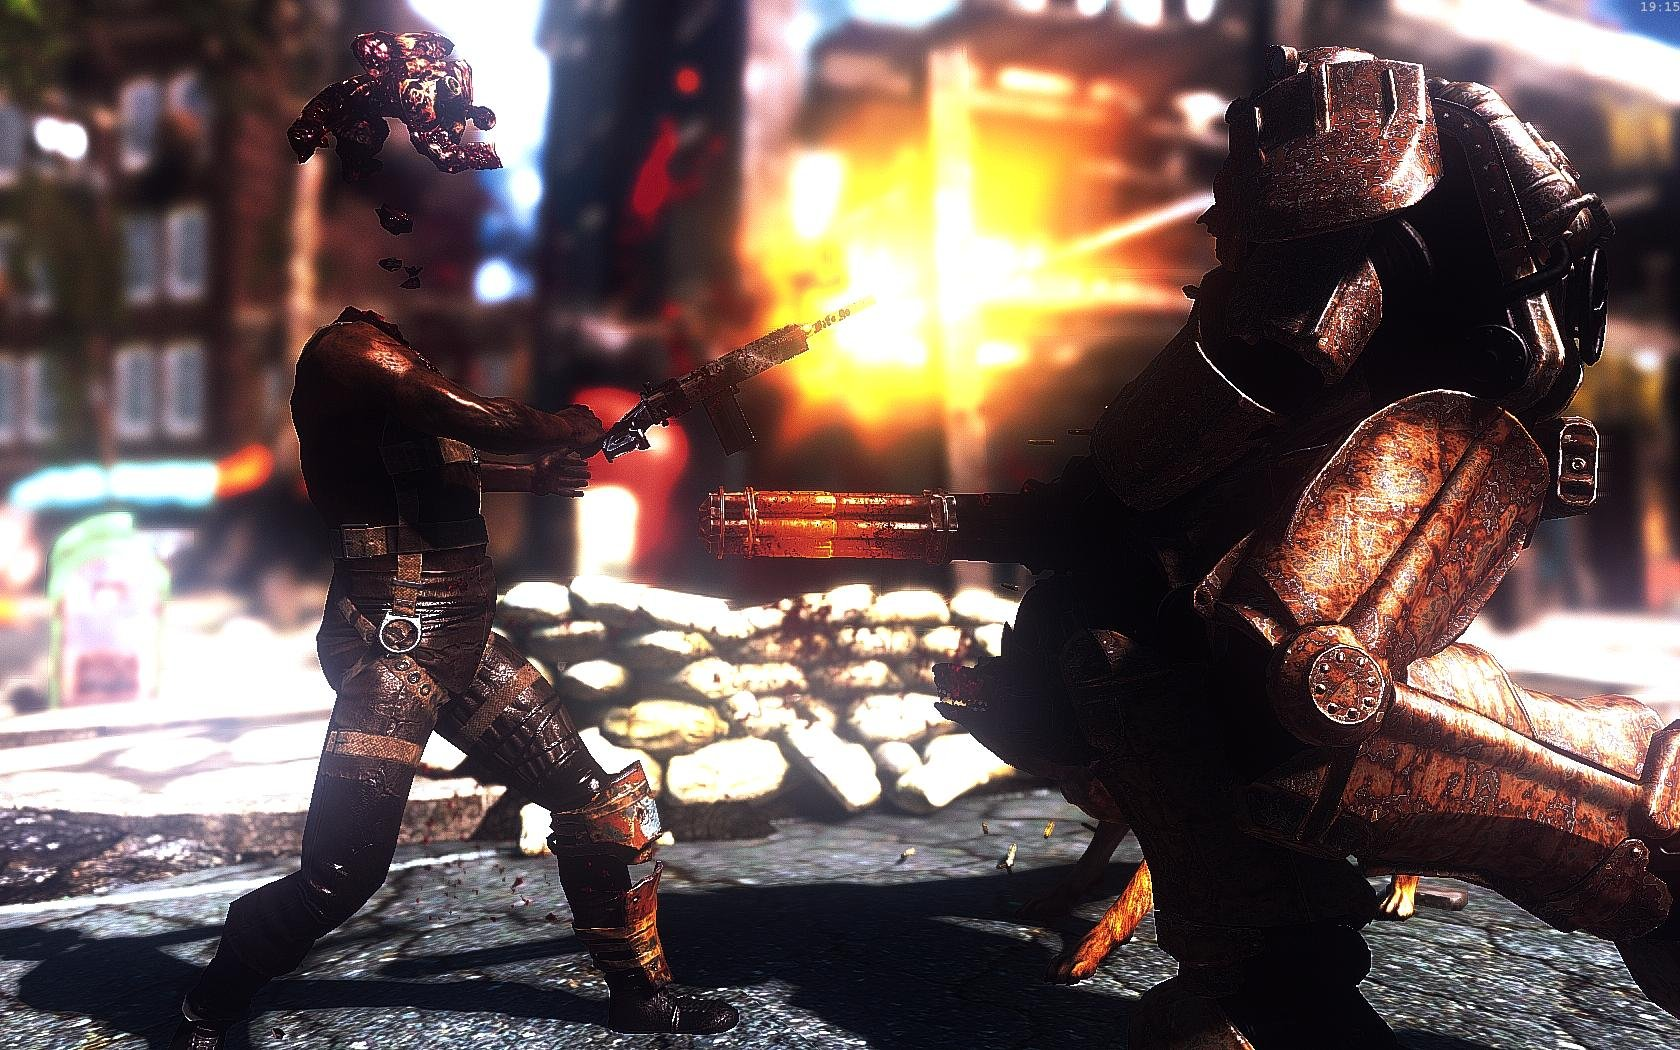 Fallout4 2019-01-17 19-15-18-37